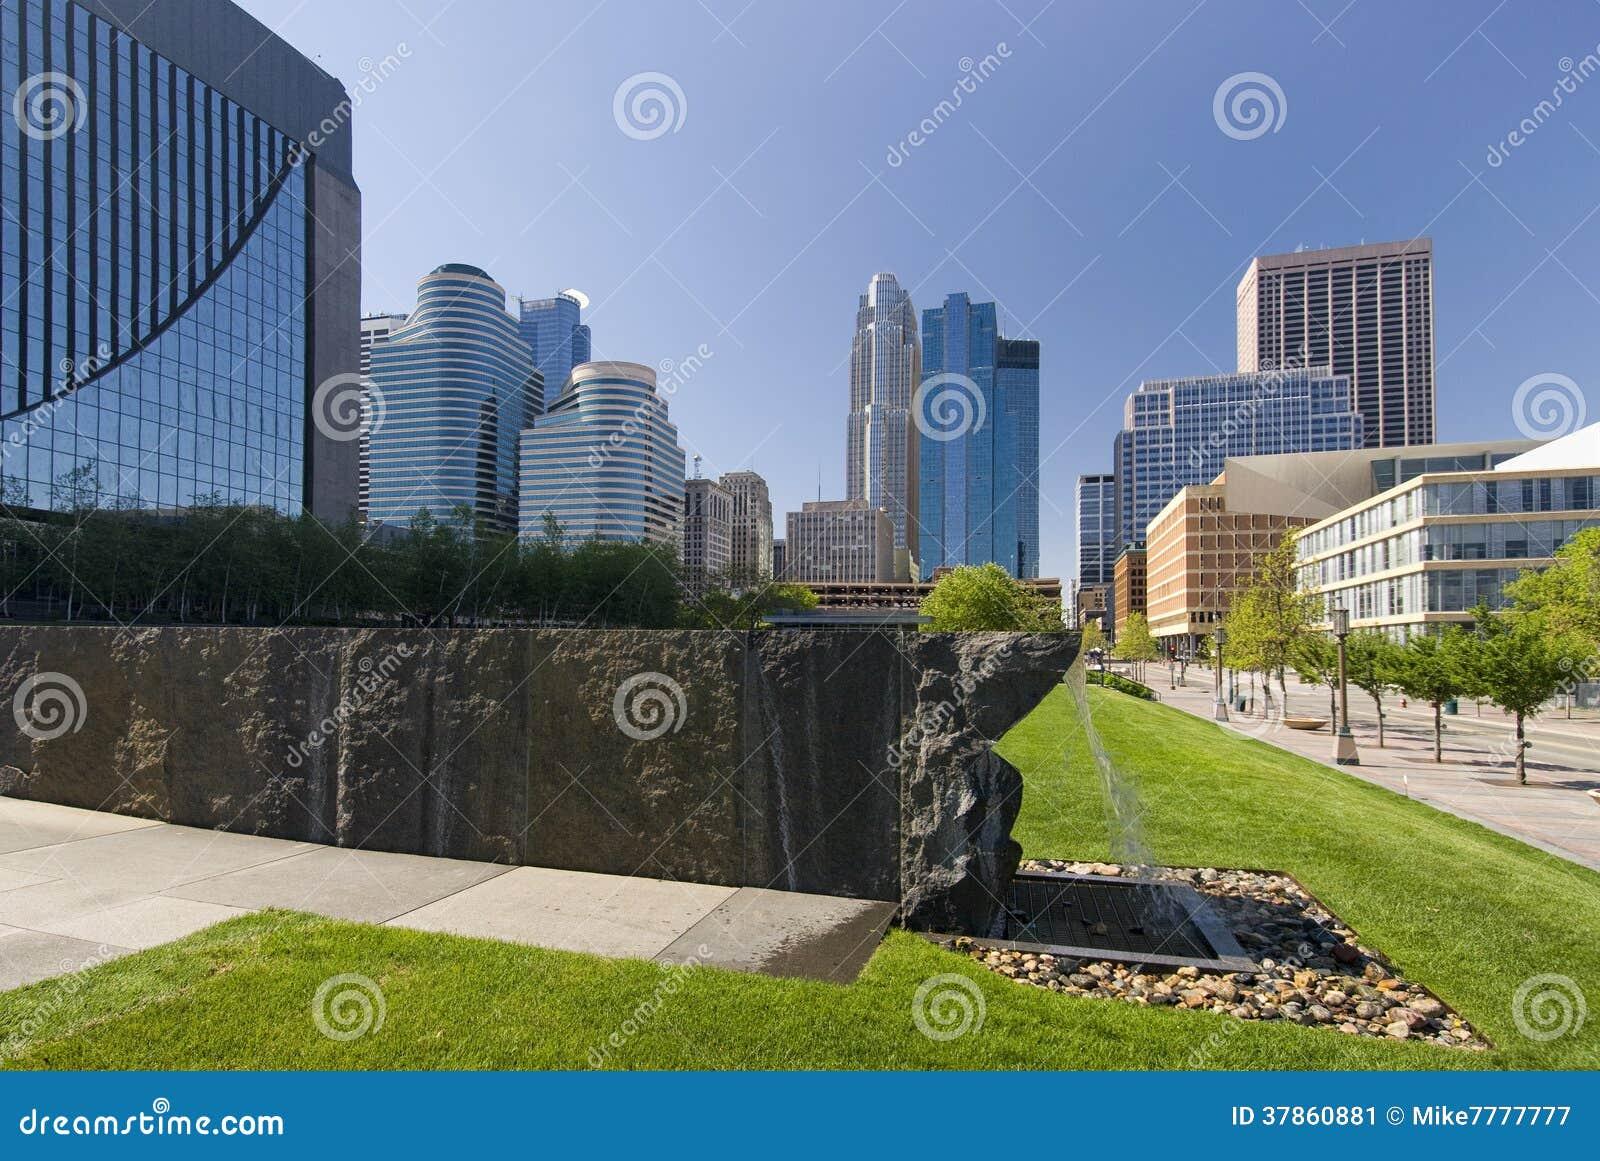 Downtown Minneapolis skyline, Minnesota, USA